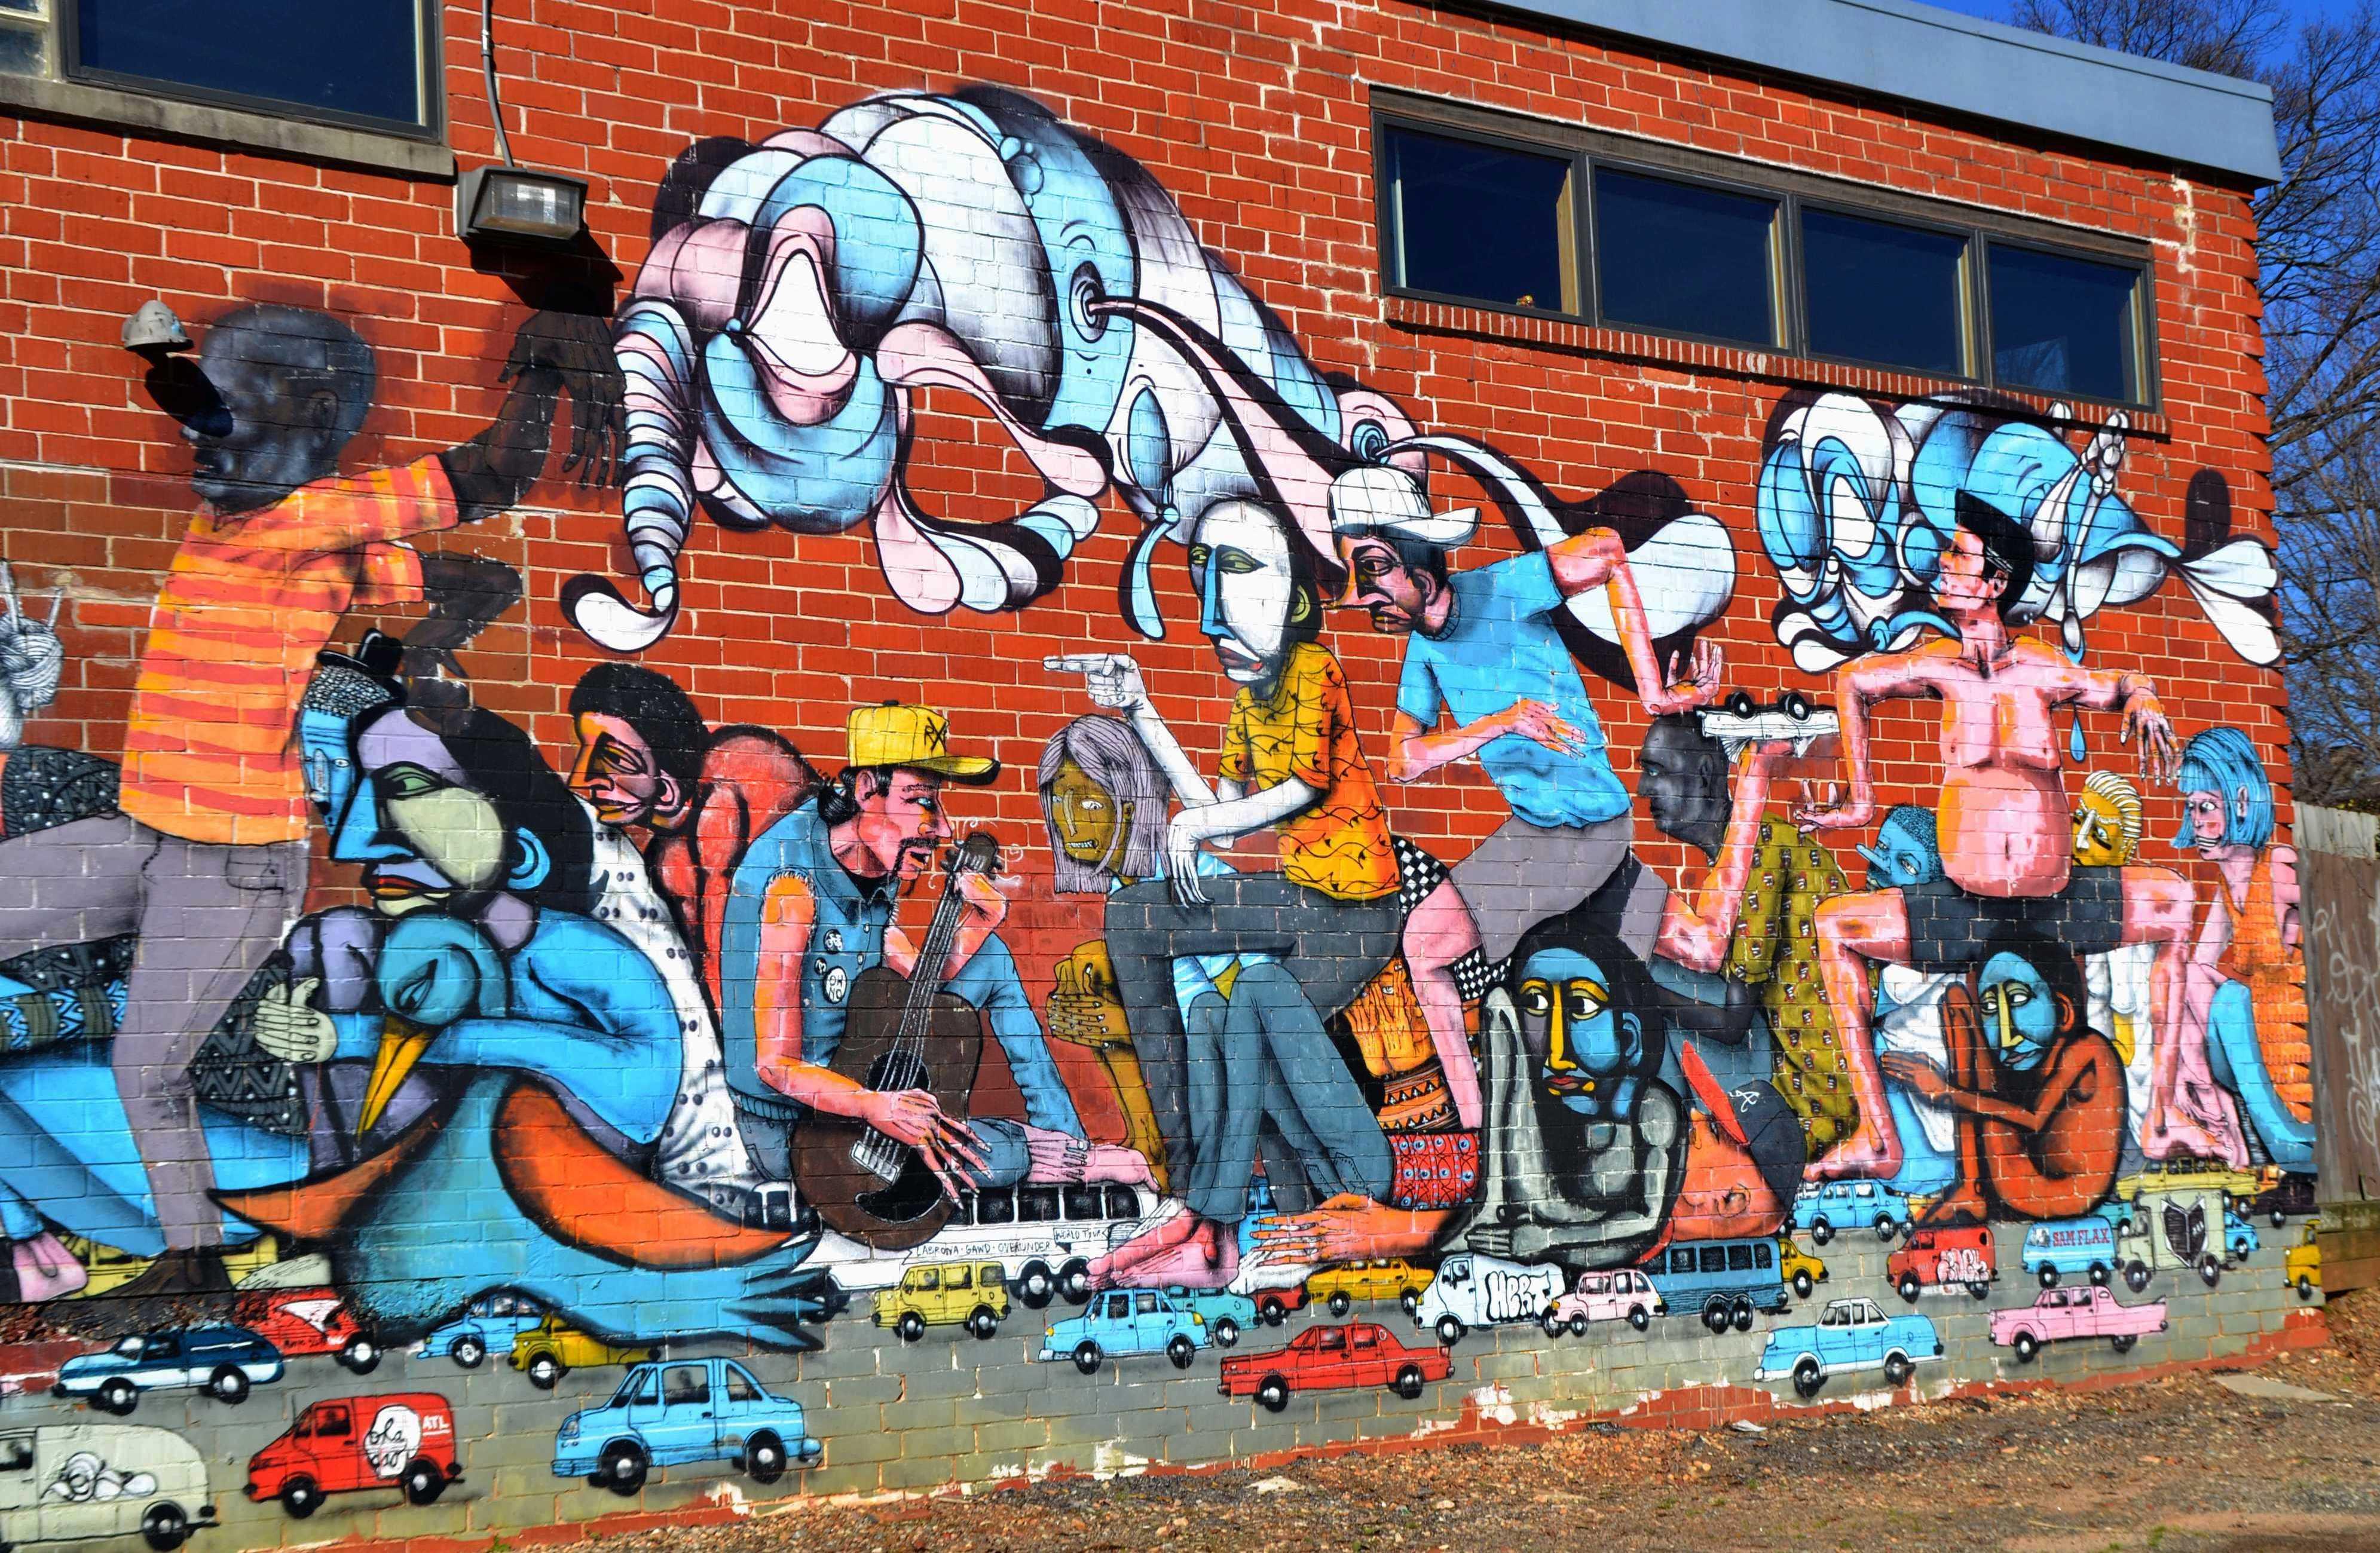 pics photos 3d graffiti art mural on the wall graffiti retro graffiti artistic urban background wall mural